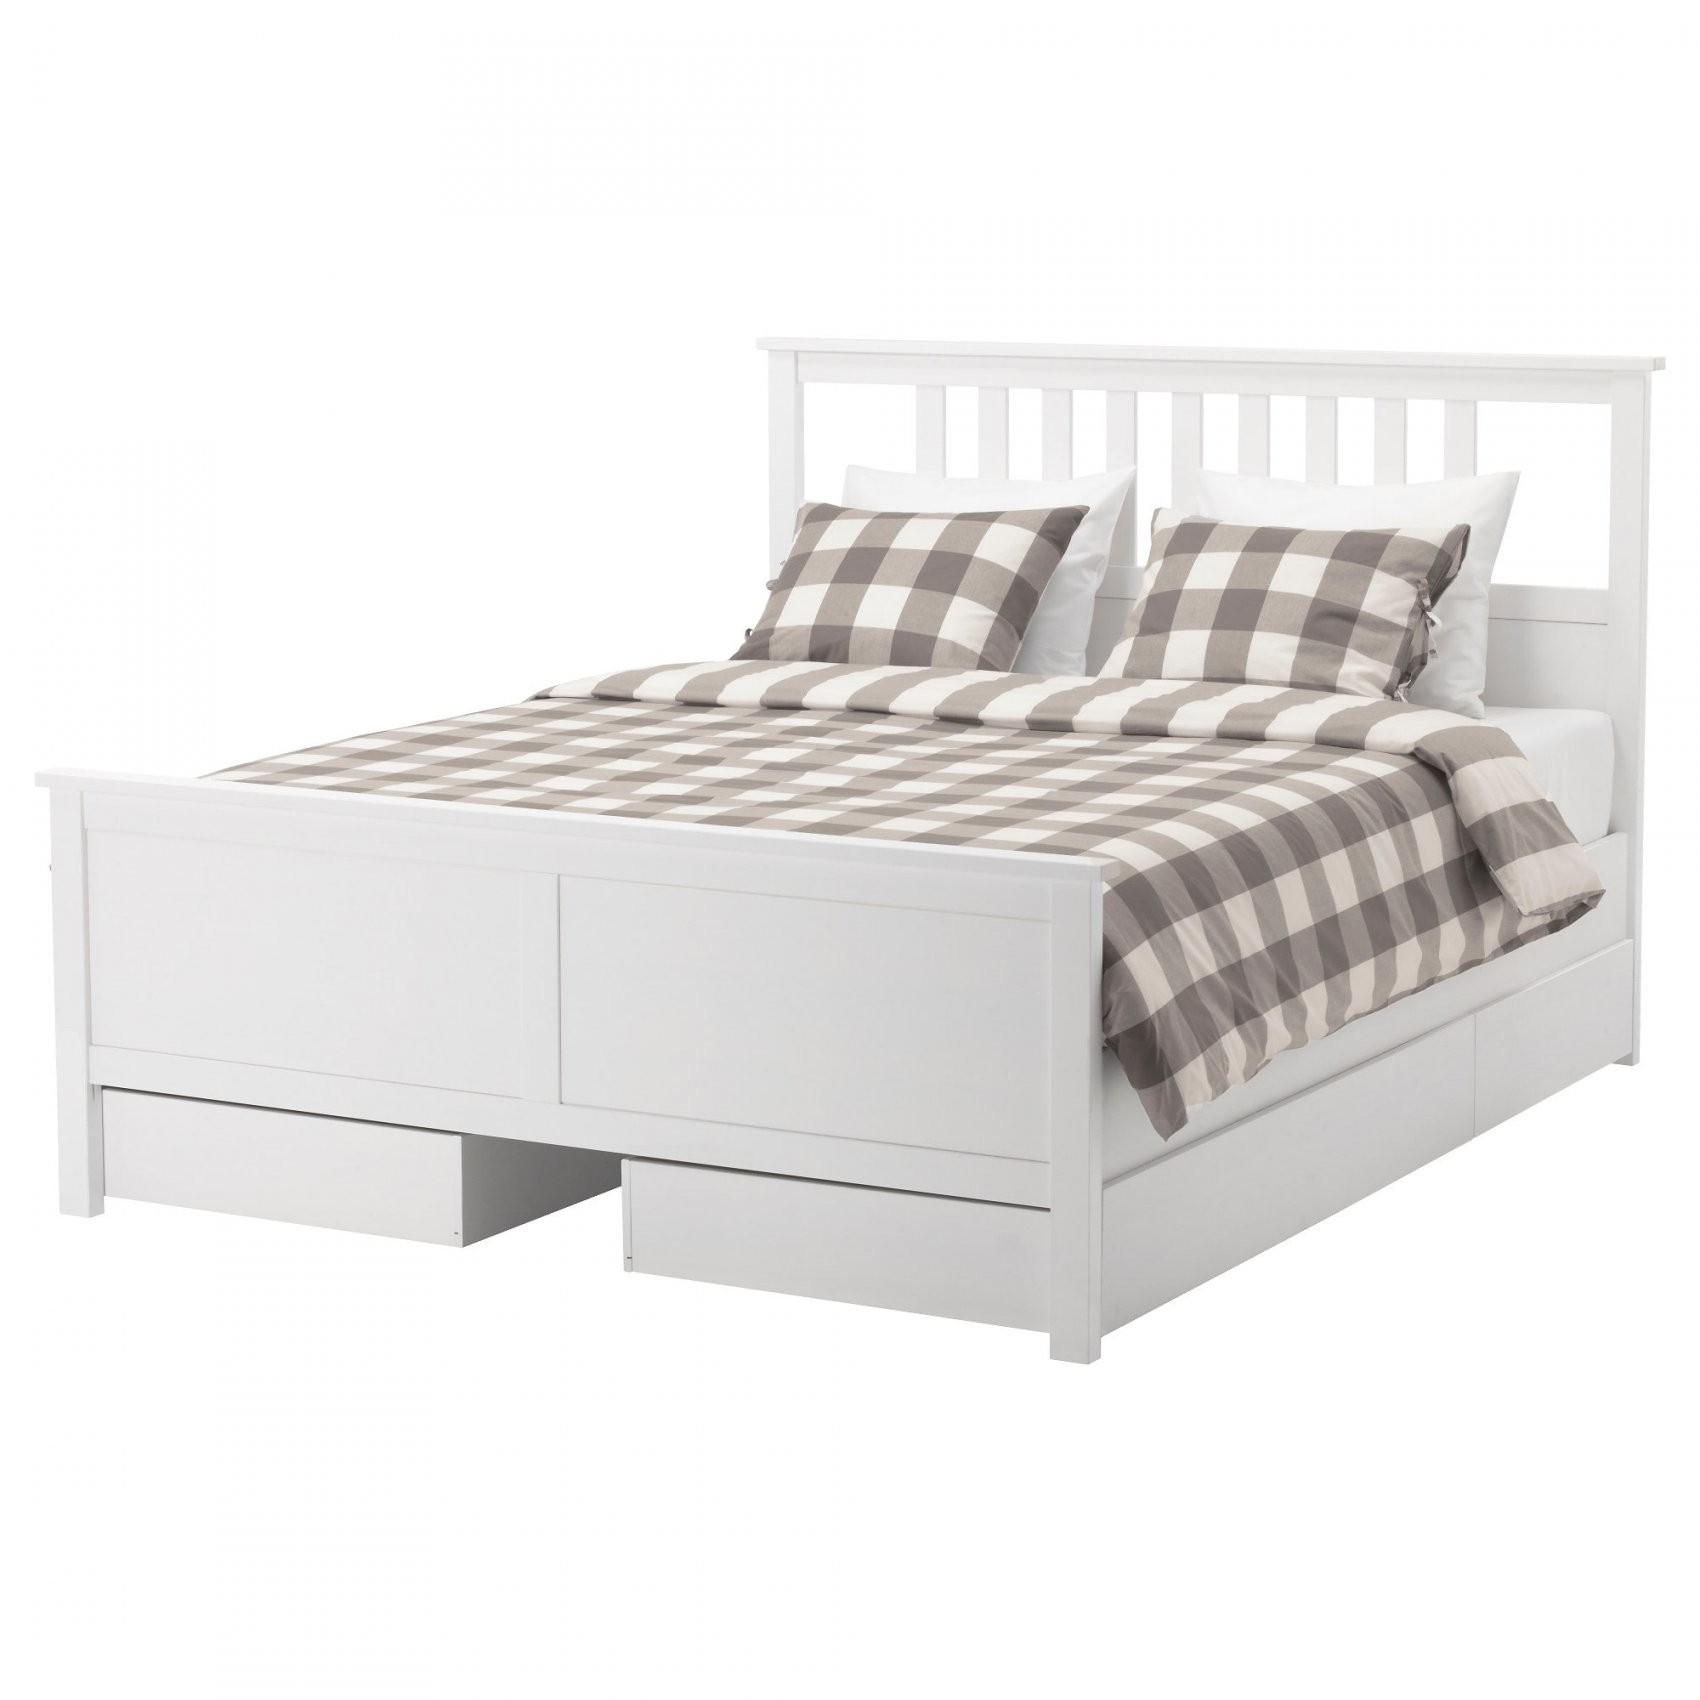 Hemnes Bedframe Met 4 Bedlades  140X200 Cm  Witgebeitst  Ikea von Hemnes Bett 140X200 Photo